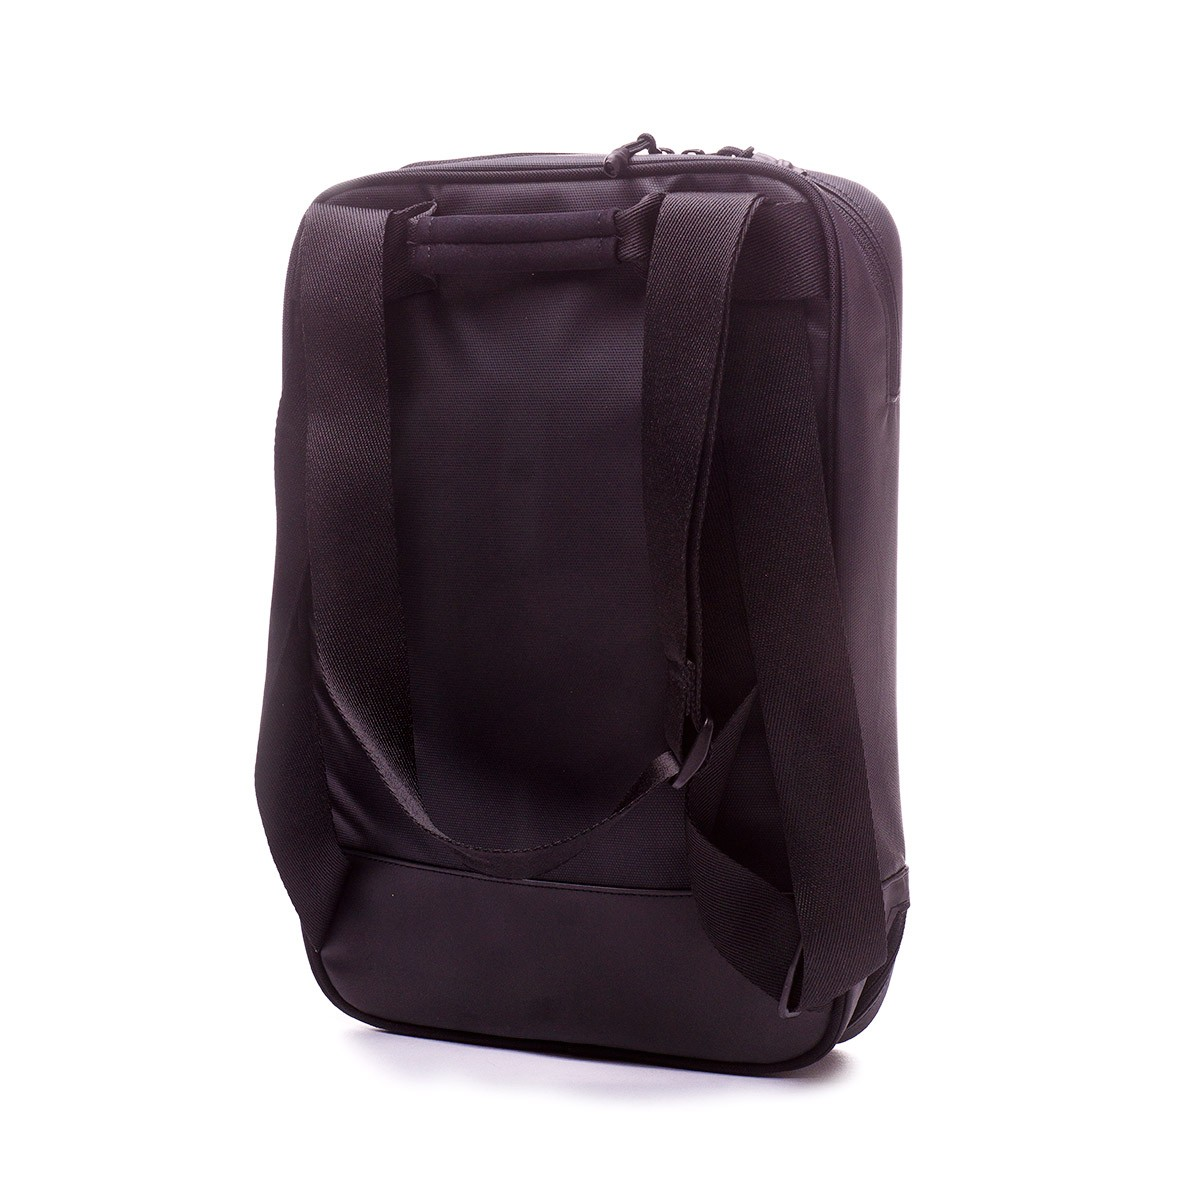 Intacto espejo Rebelión  Backpack adidas ZNE Compact Black-White - Football store Fútbol Emotion